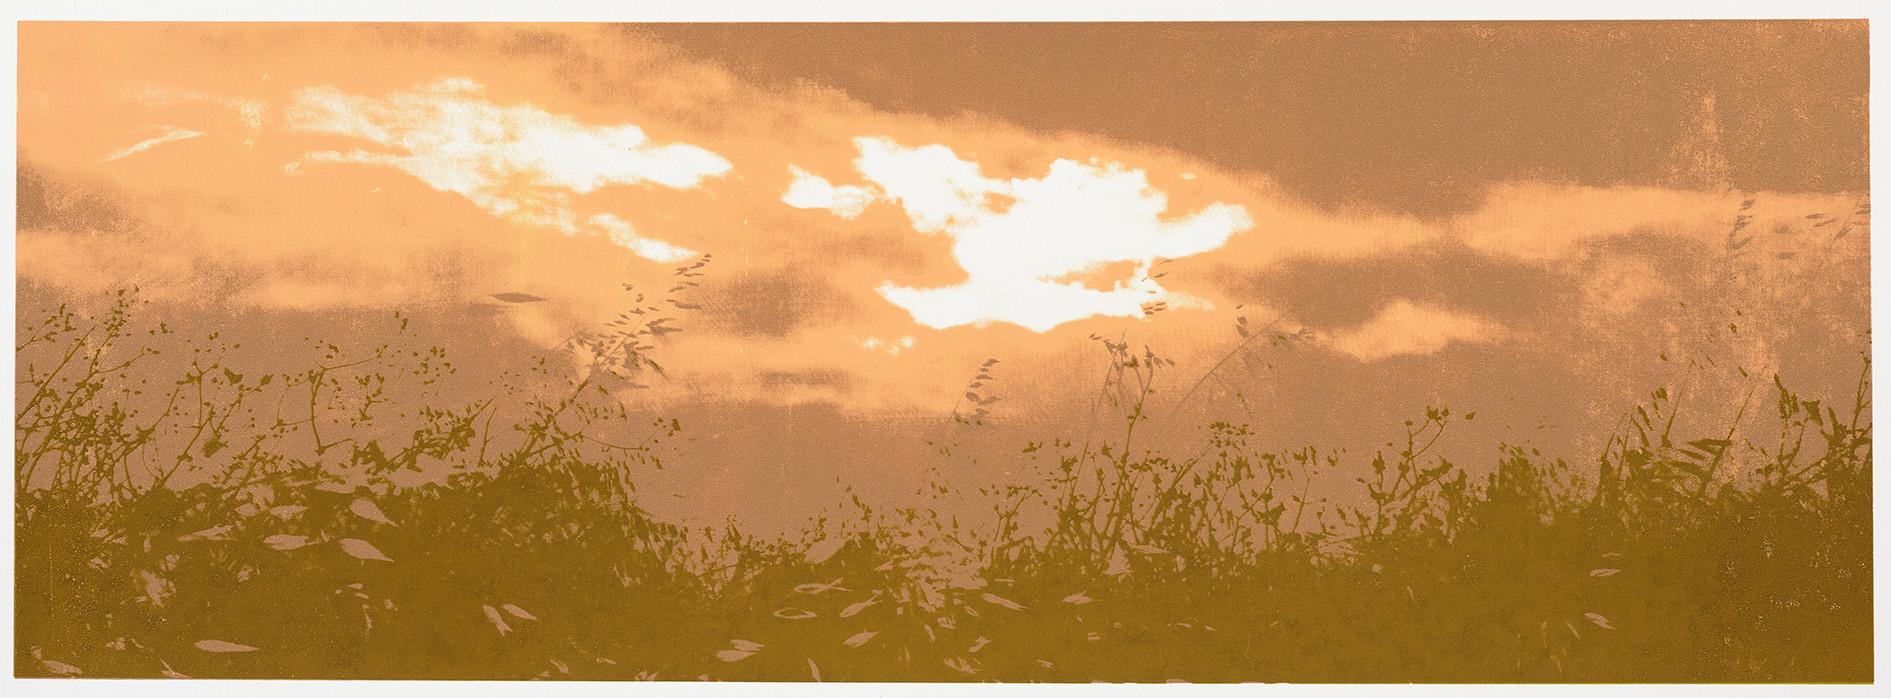 """Change of Seasons IV (fall)"", 35 x 100 cm. silkscreenprint (2015)"